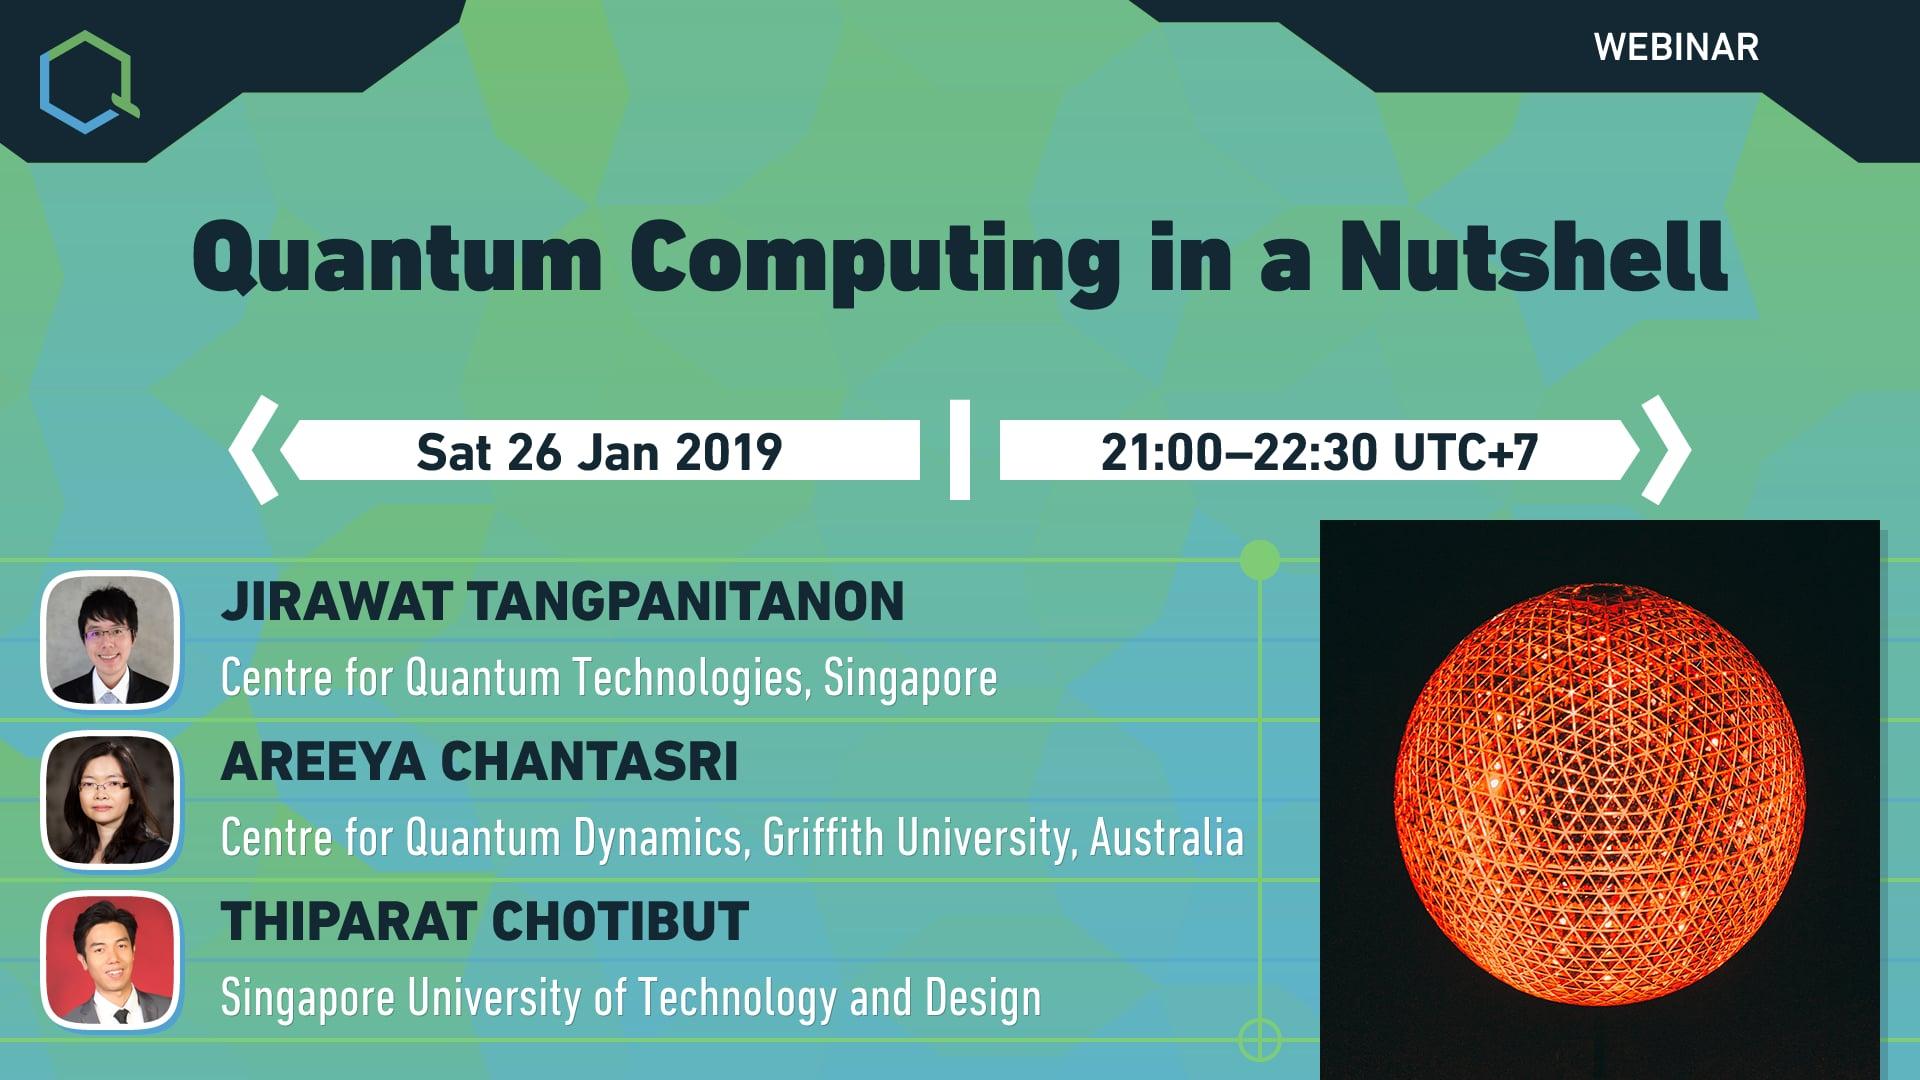 Quantum Computing in a Nutshell